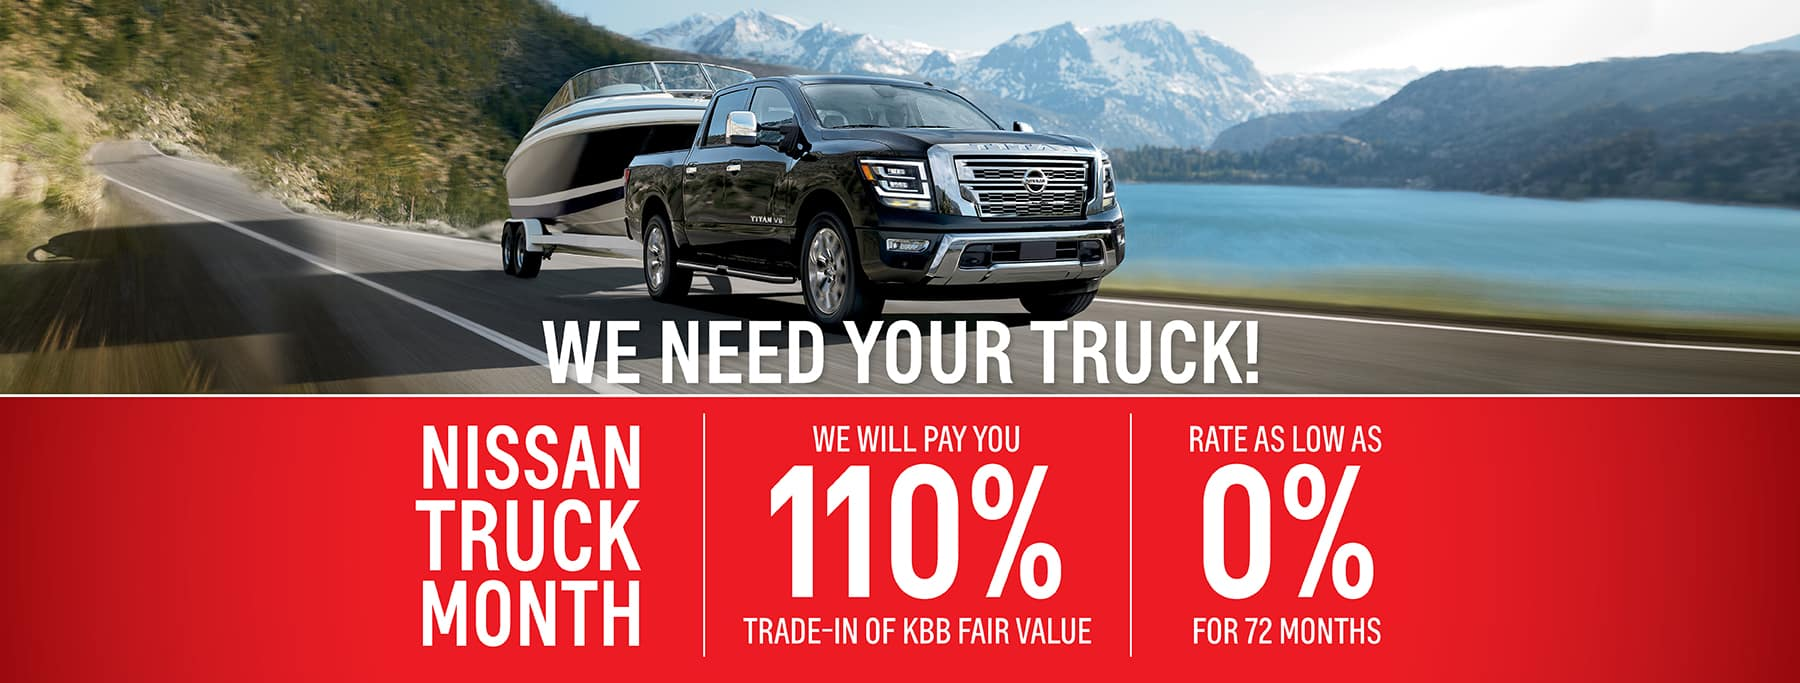 KPN-Web-Banner-0920-Titan-Truck-Month